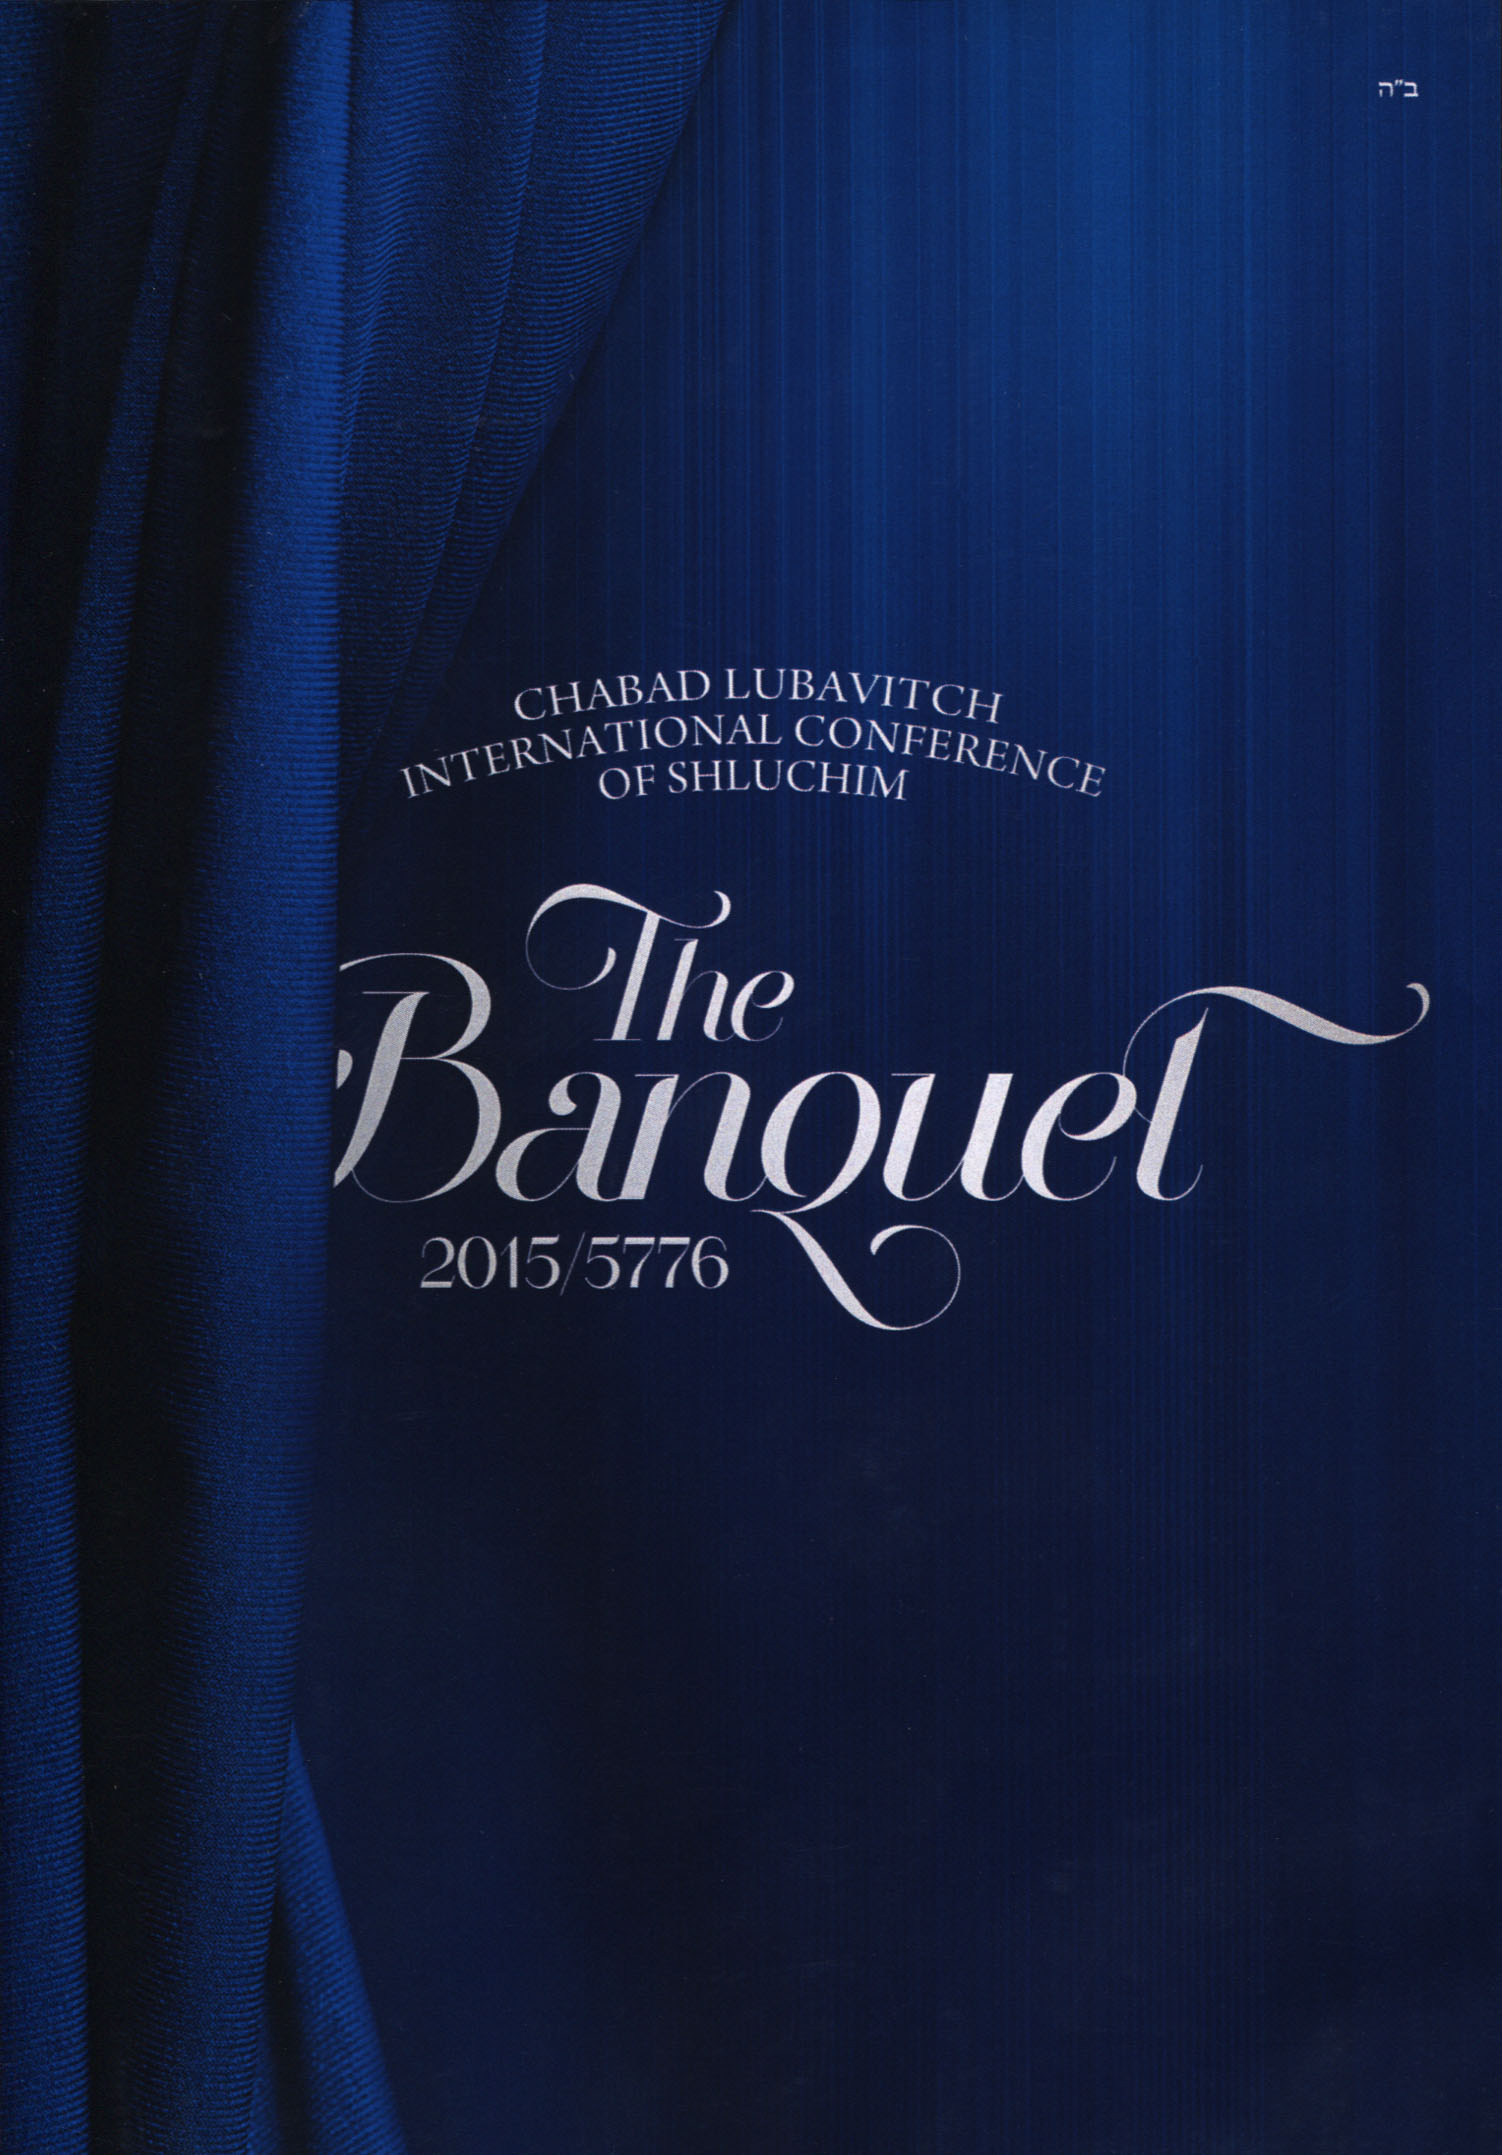 The Banquet: 2015/5776